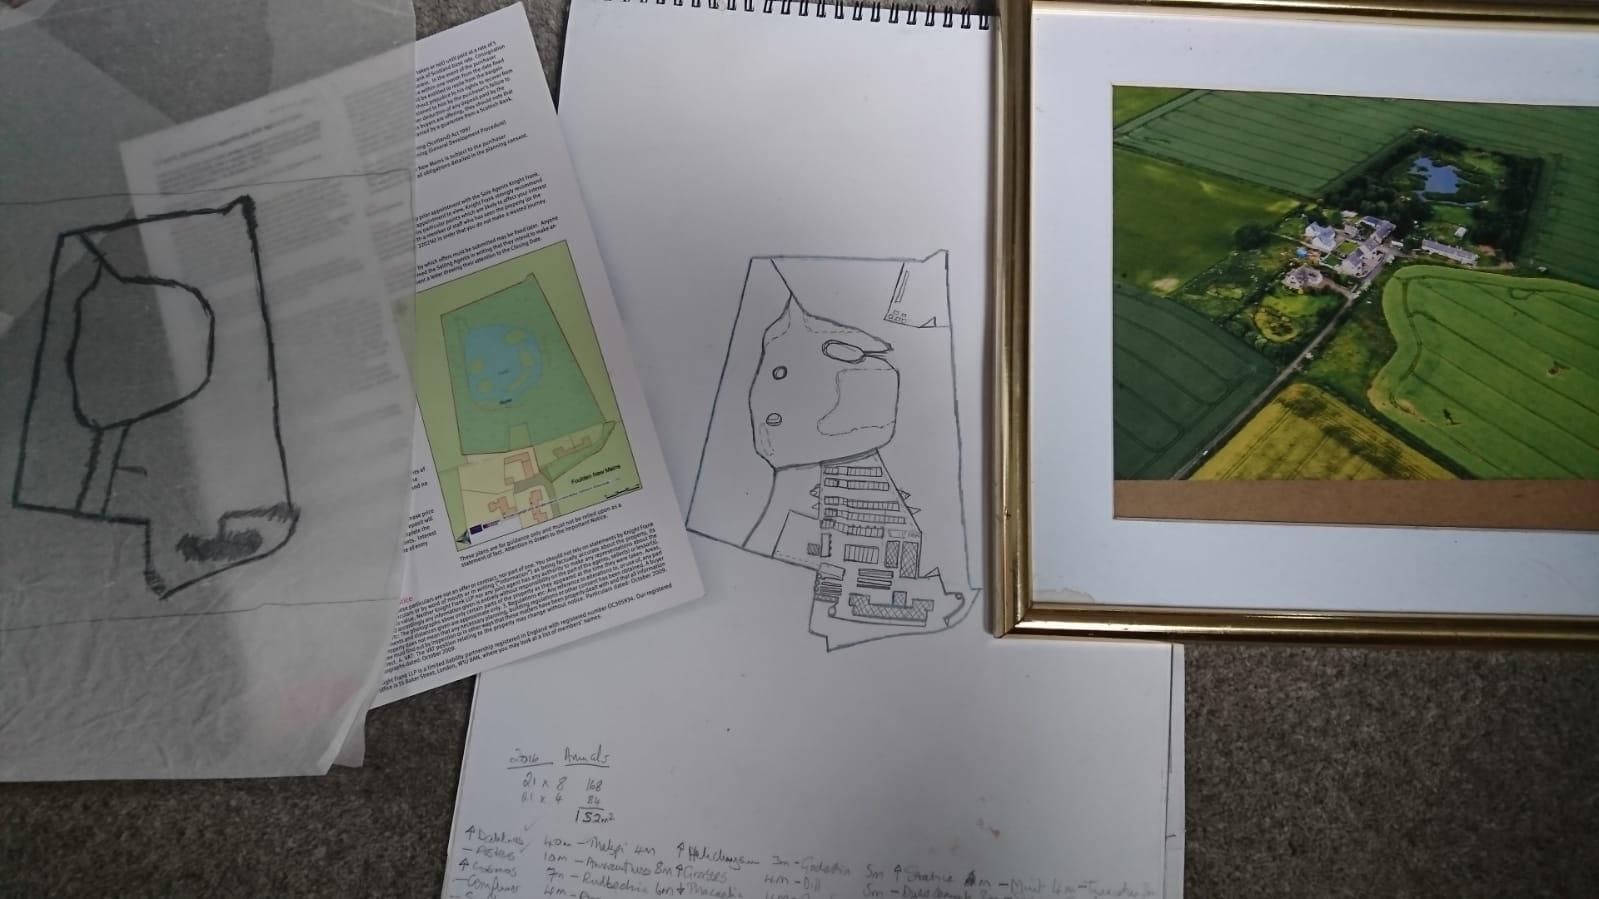 Plans of Millpond Flower Farm